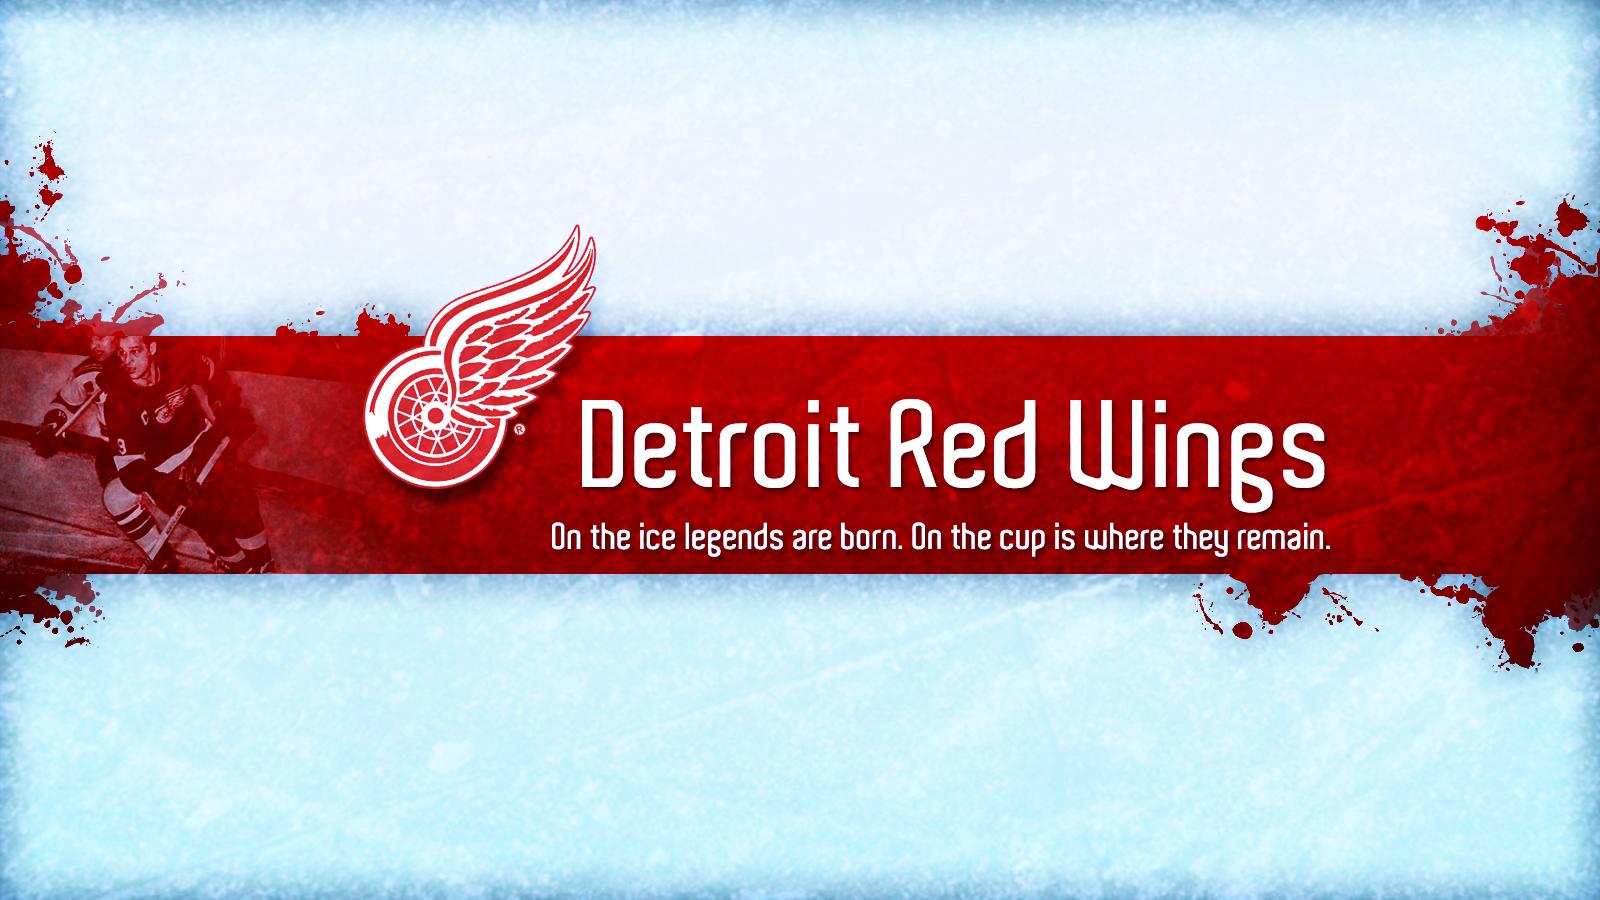 detroit red wings hockeytown desktop 1600x900 hd wallpaper 763825jpg 1600x900